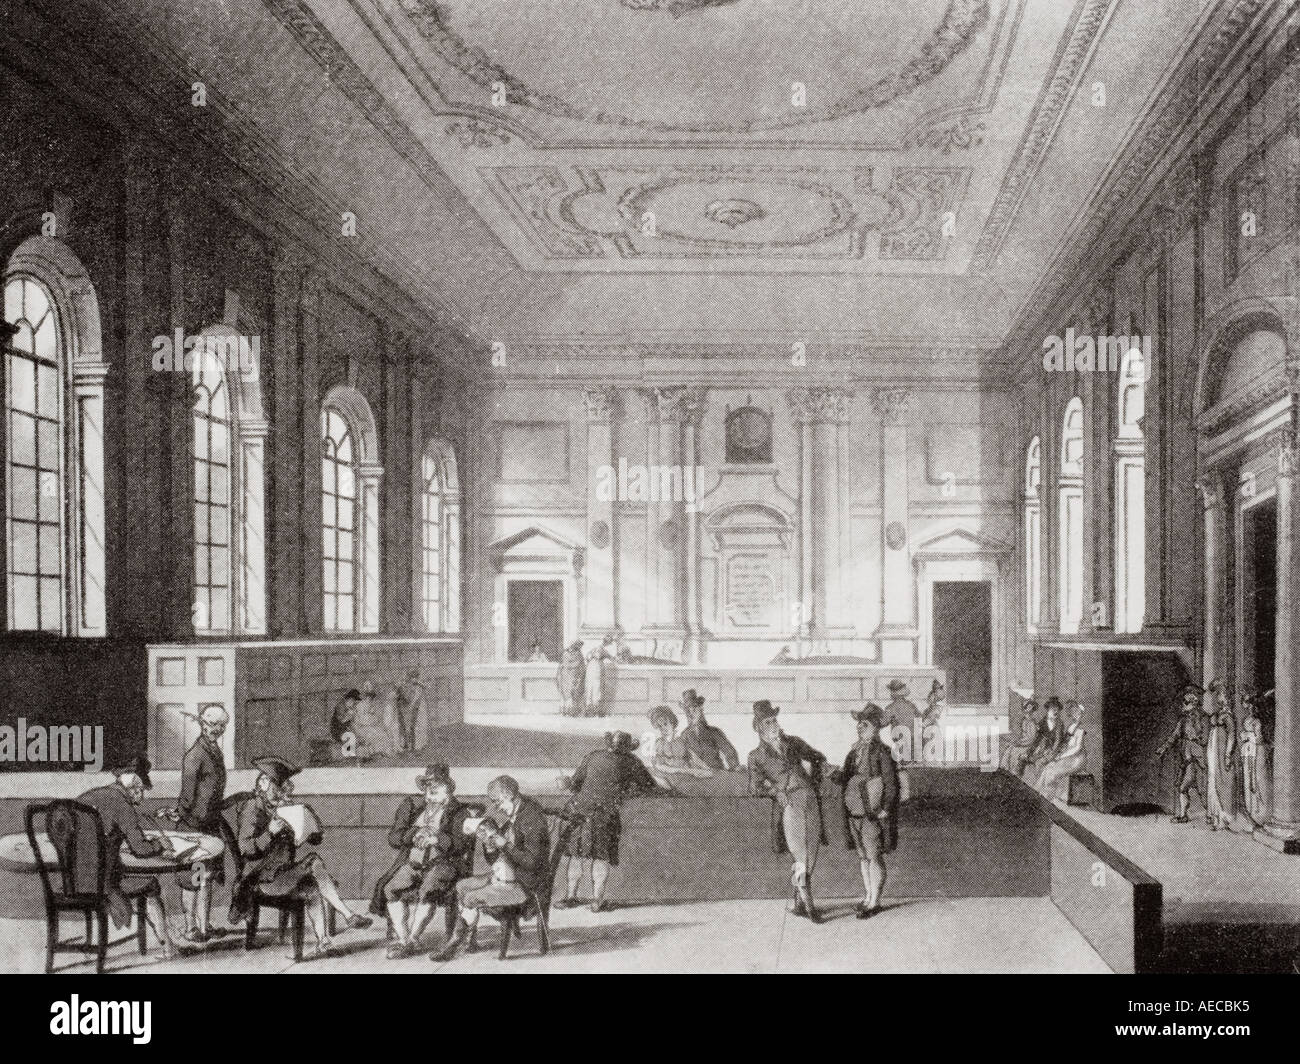 The South Sea House Threadneedle Street London - Stock Image